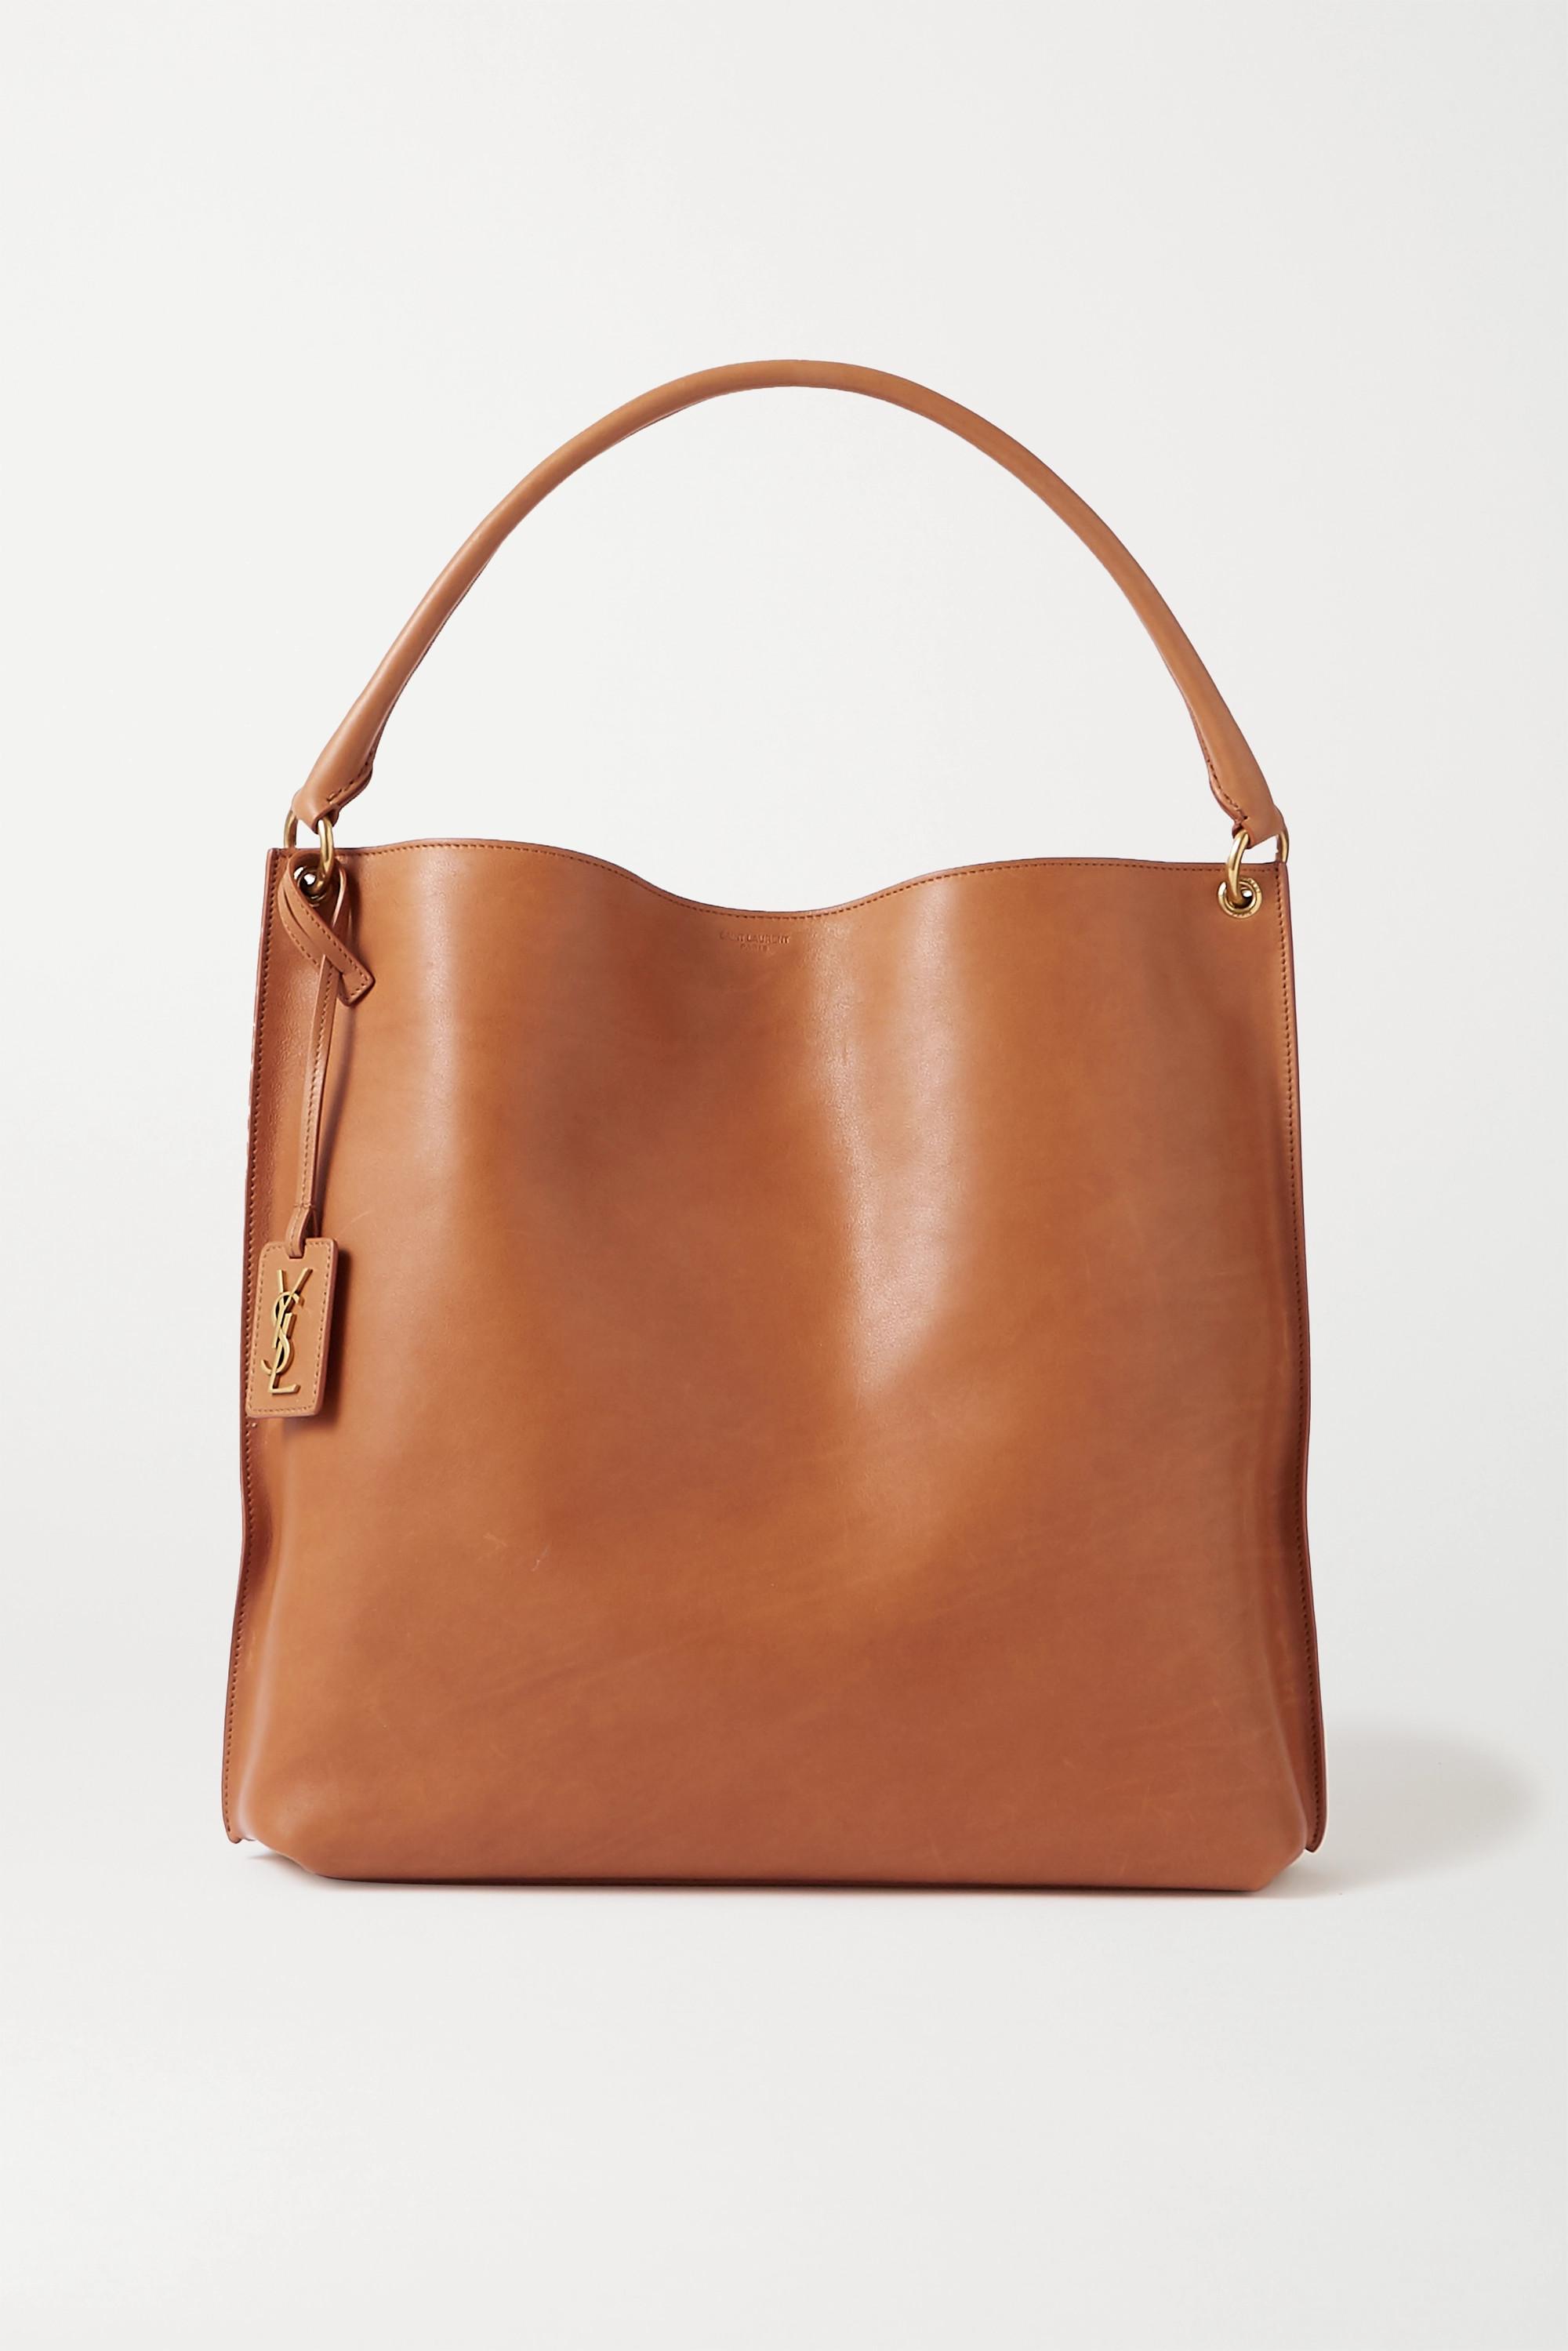 SAINT LAURENT Tag leather tote